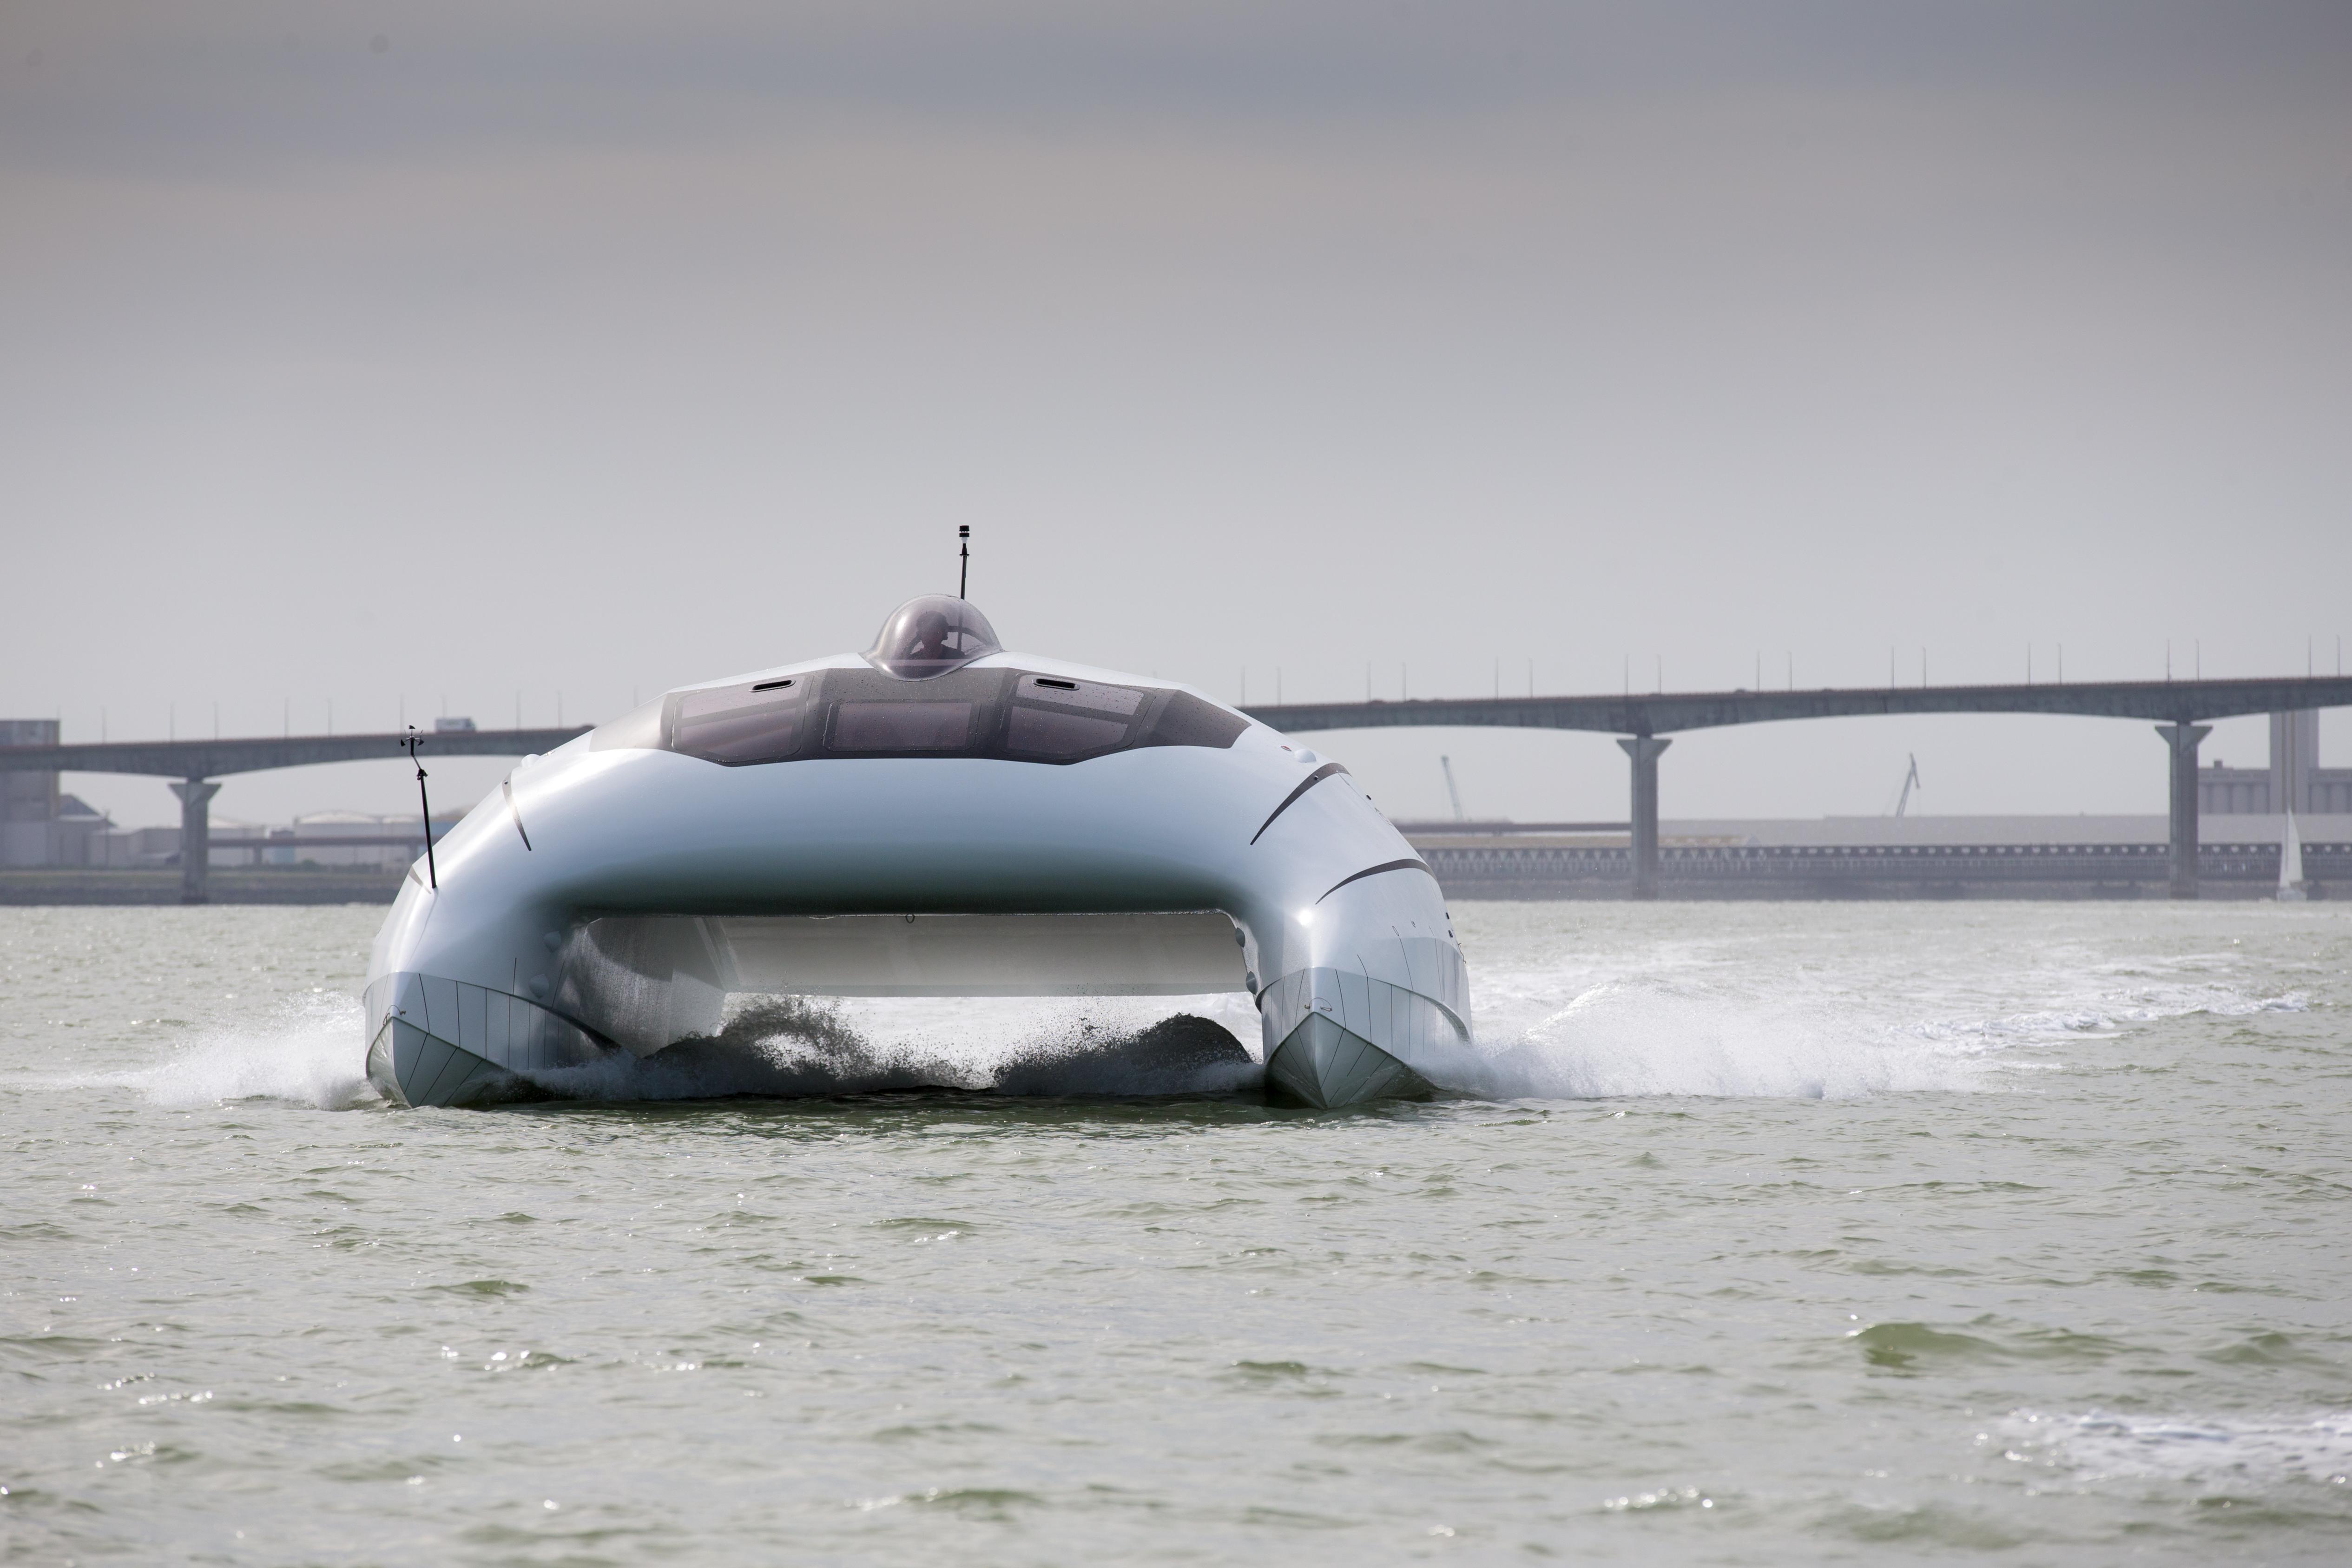 lili le prototype d a2v navigue 50 noeuds maritime. Black Bedroom Furniture Sets. Home Design Ideas